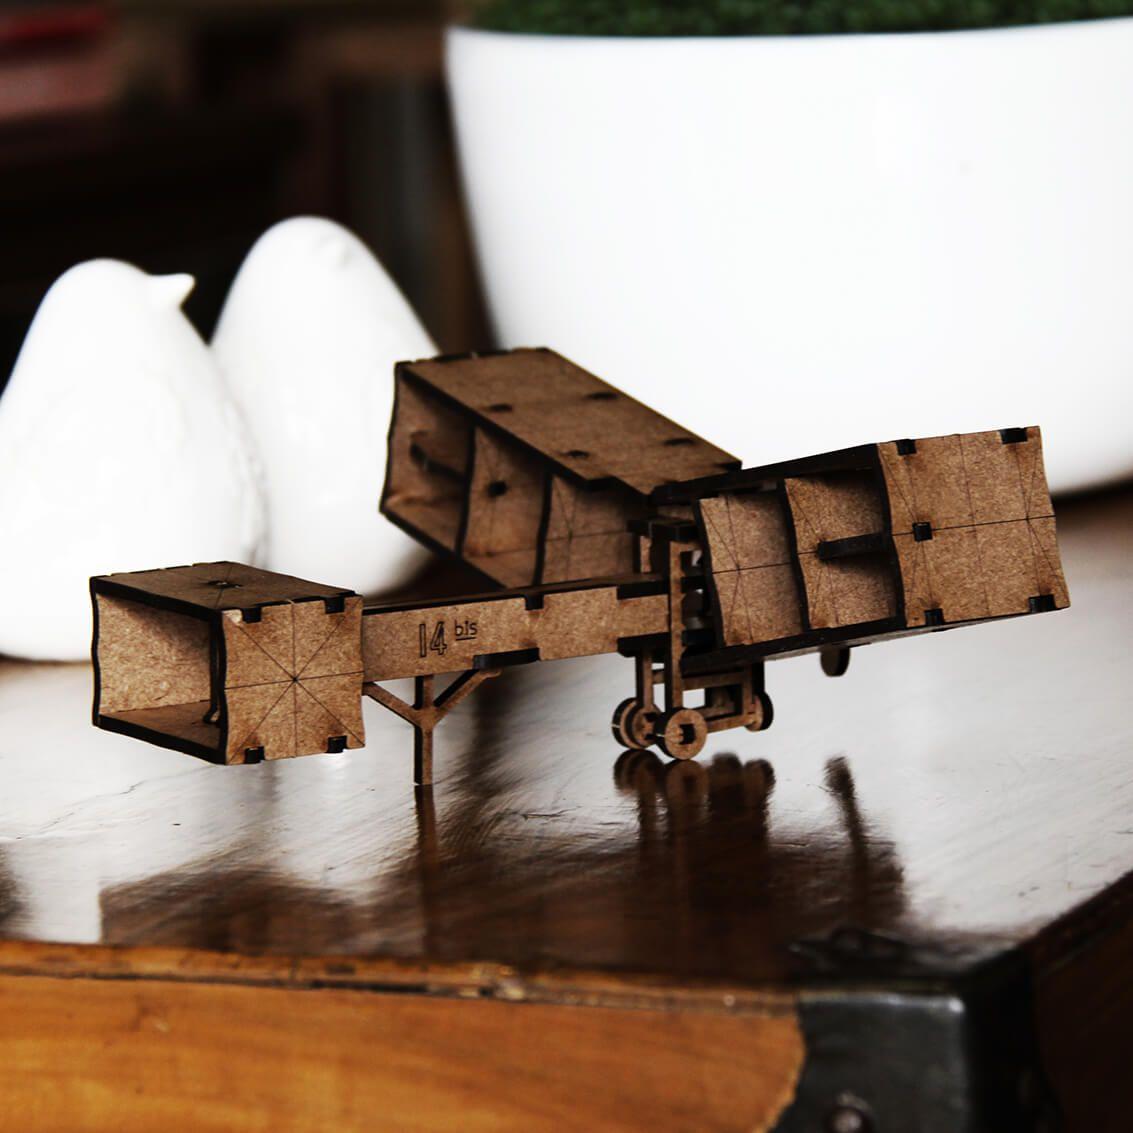 Aviões - Miniatura para montar 14 bis